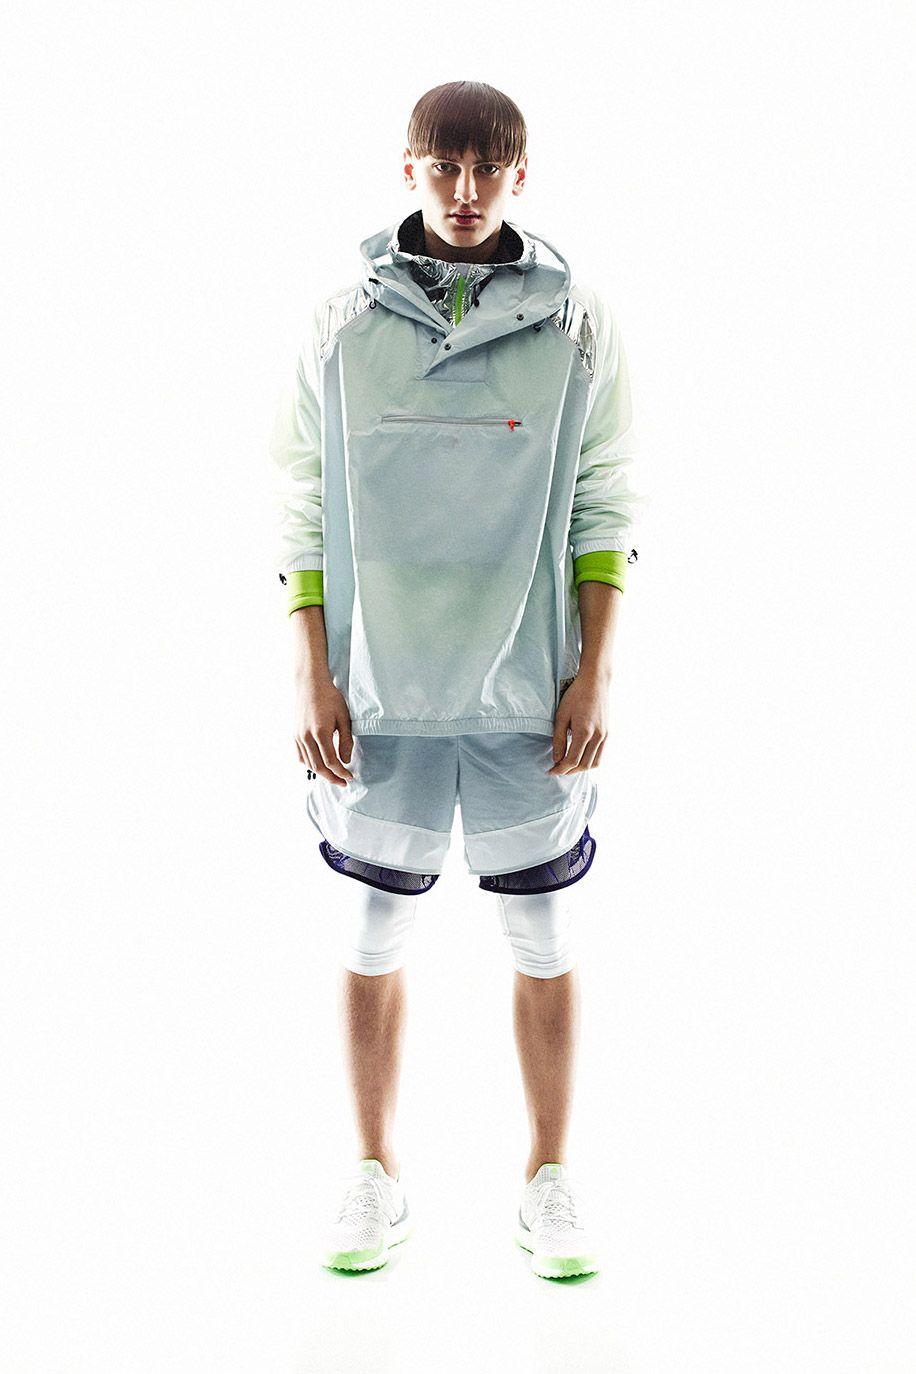 adidas & kolor Showcase High Tech FallWinter 2015 Lookbook